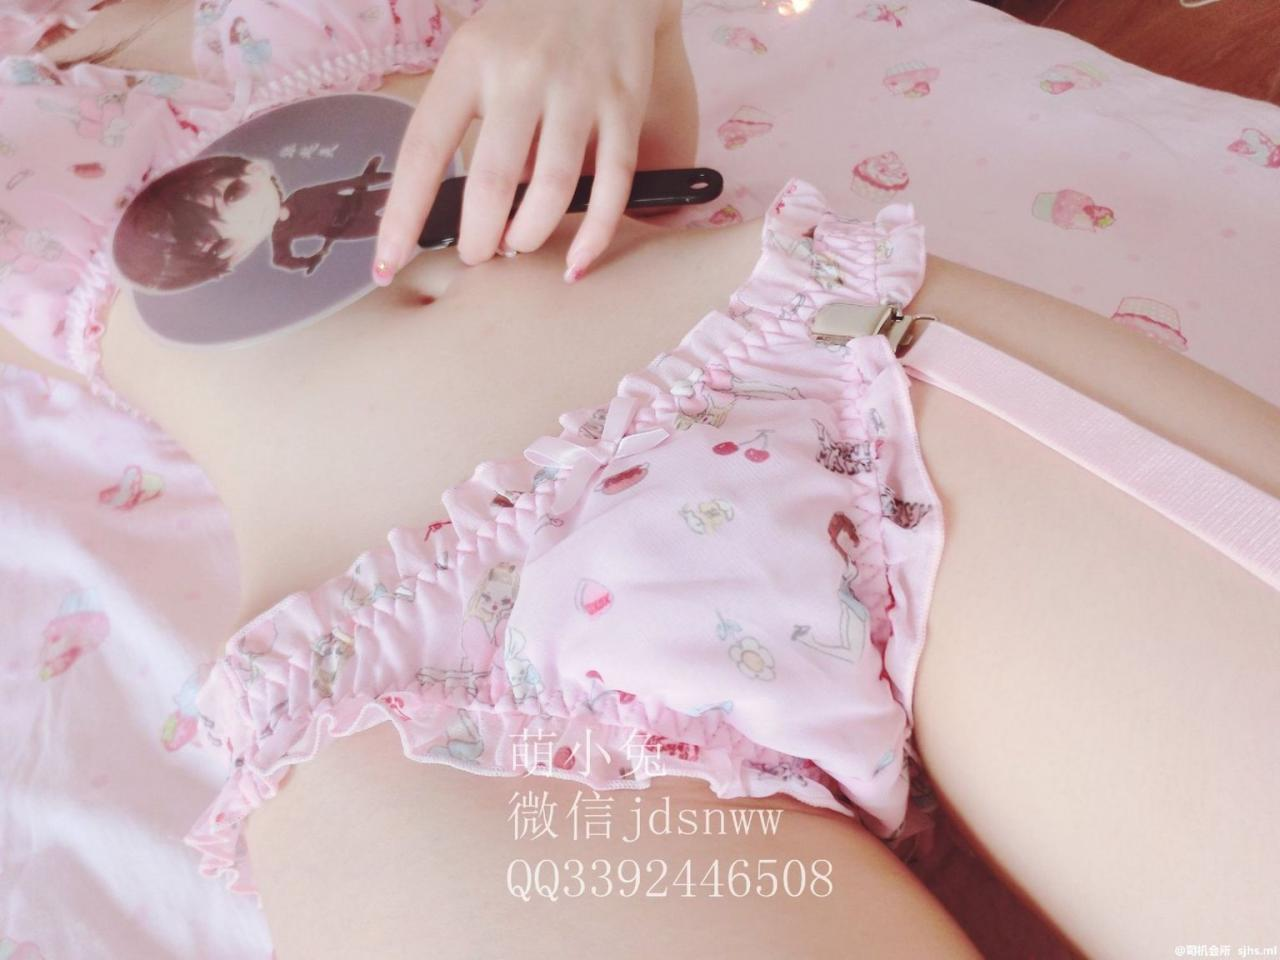 [萌小兔]Pink bikini 2 portrait 37 pieces